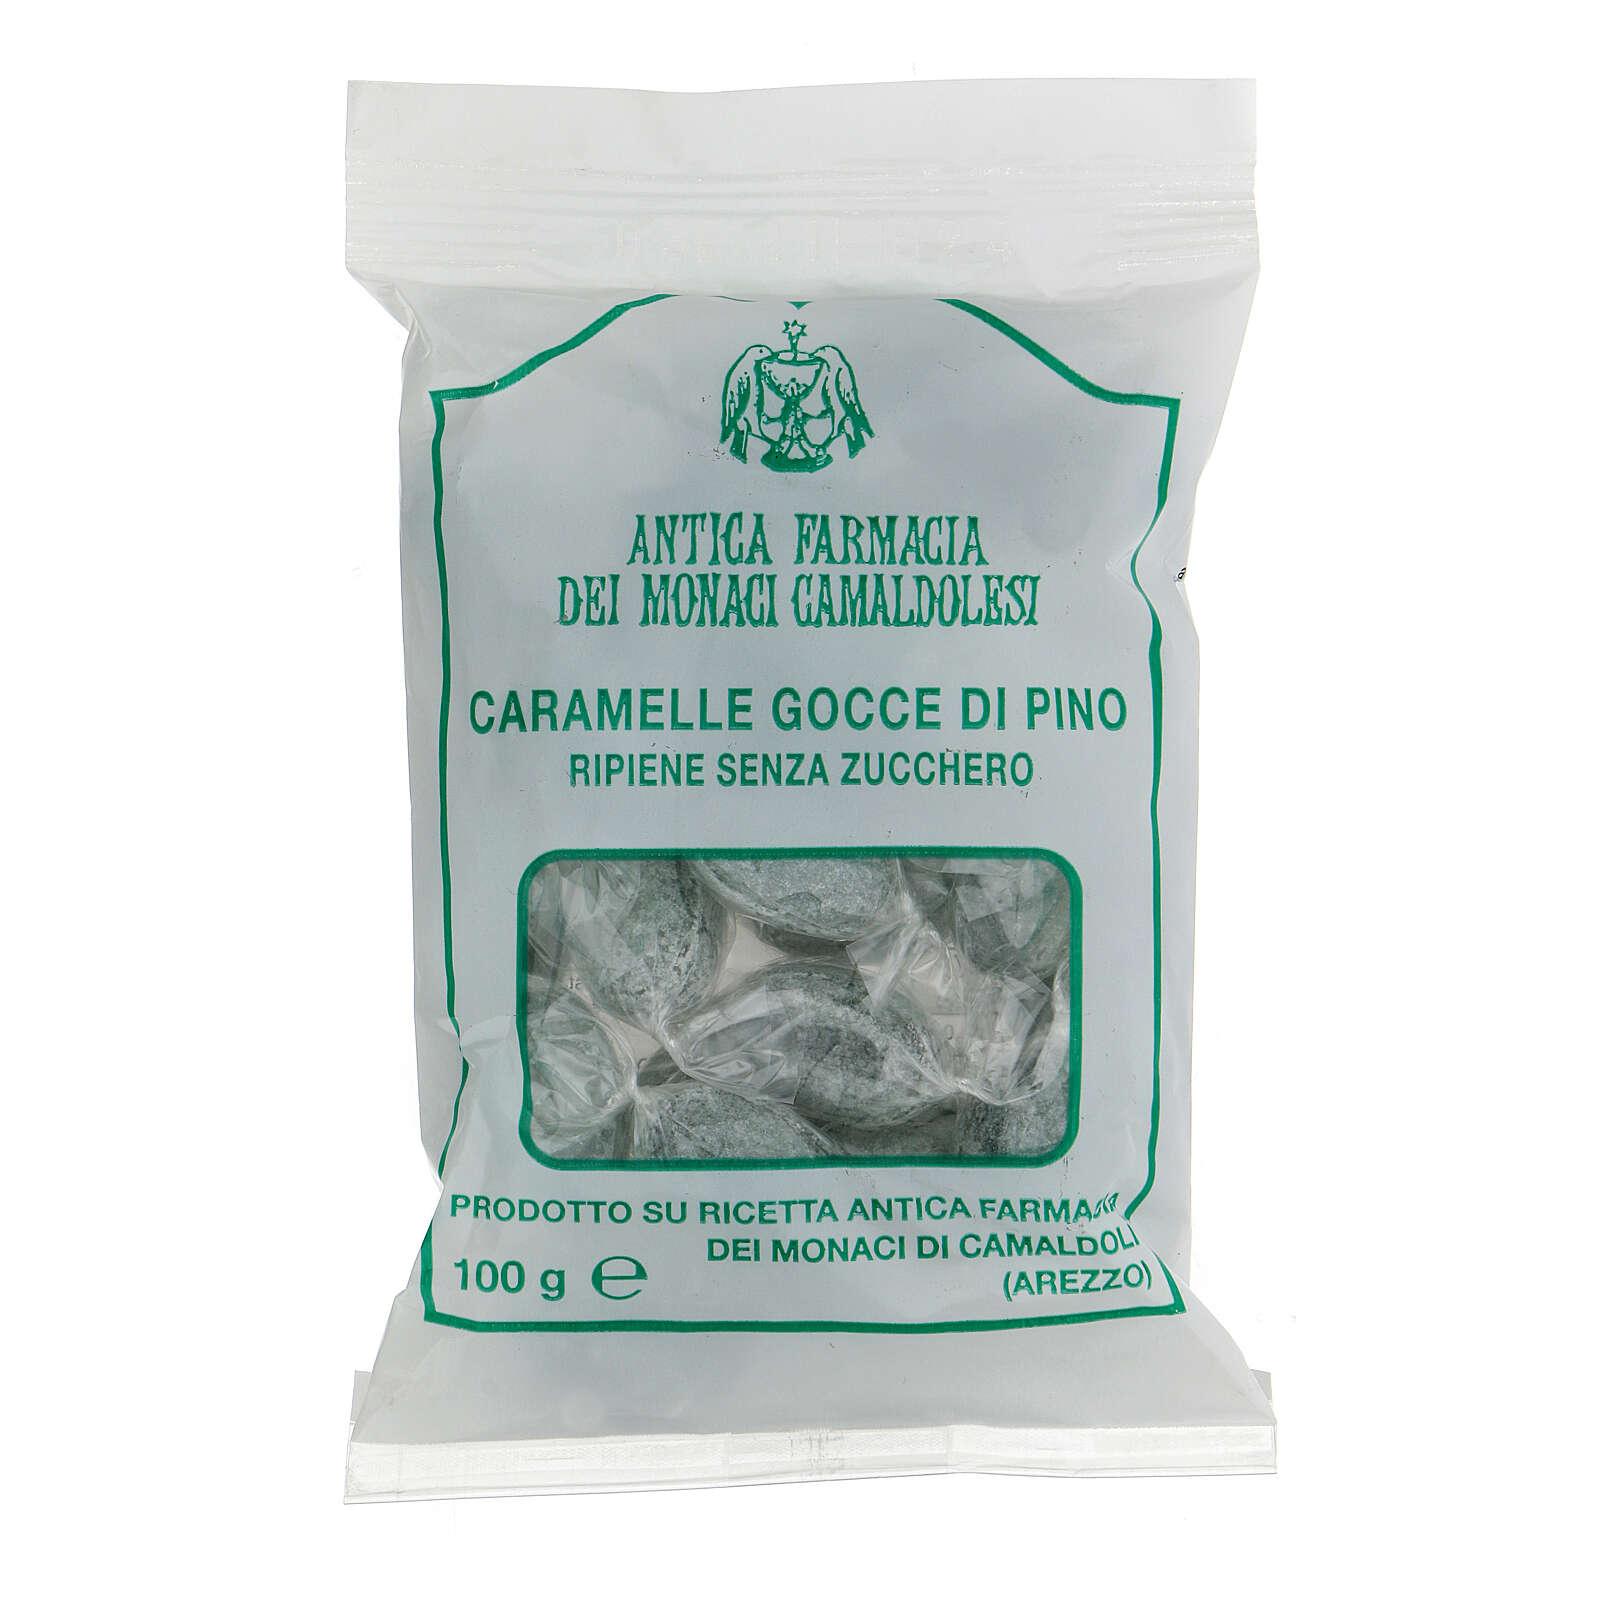 Caramelle Gocce Pino ripiene NO ZUCCHERO 100 gr Camaldoli 3